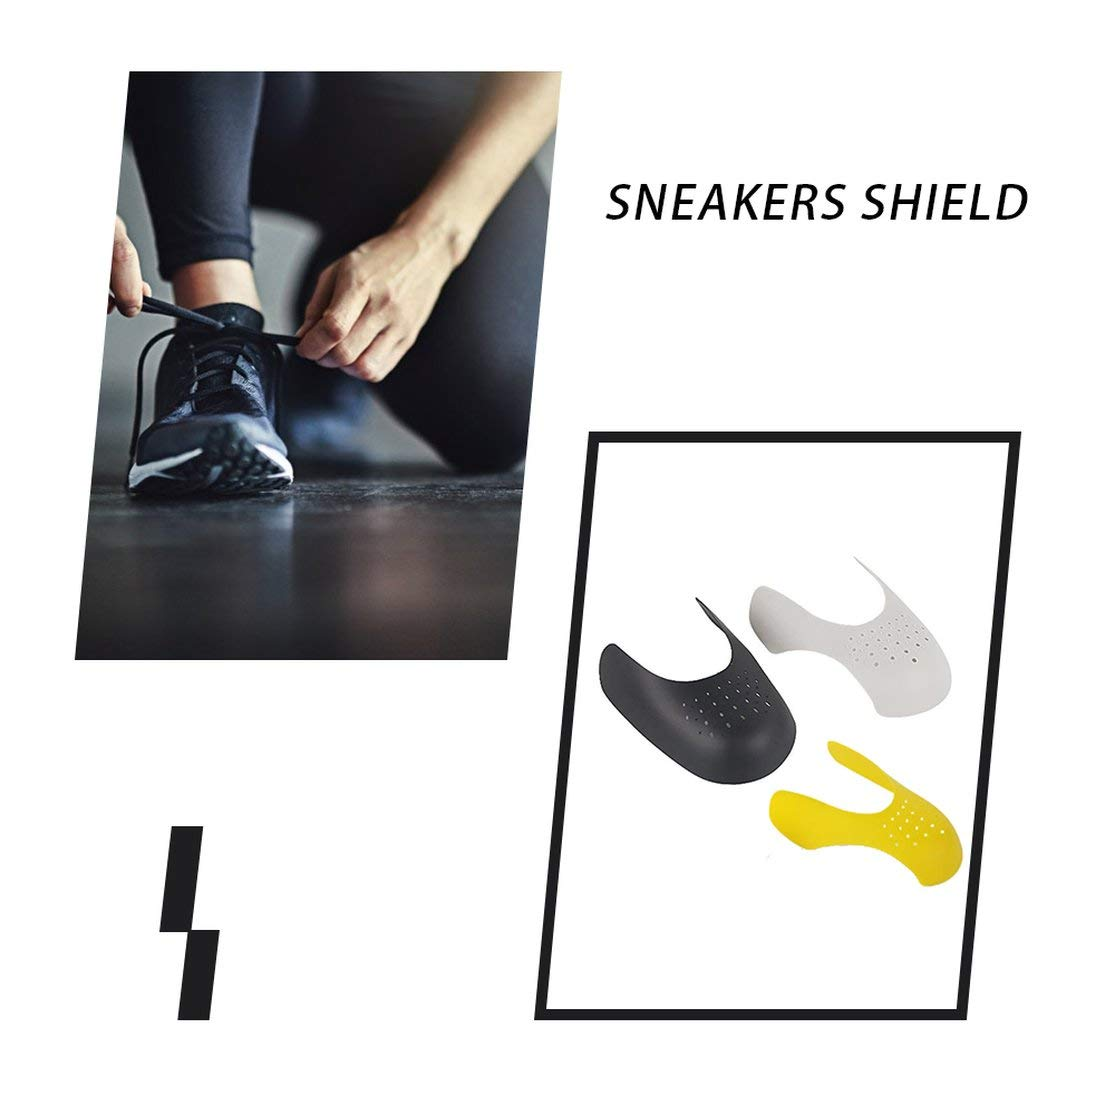 Color:gray Kaemma Embout anti-plis Artefact anti-plis Support de chaussures Support de chaussures Film anti-rides St/ér/éotype Anti-plis Sneaker Shield